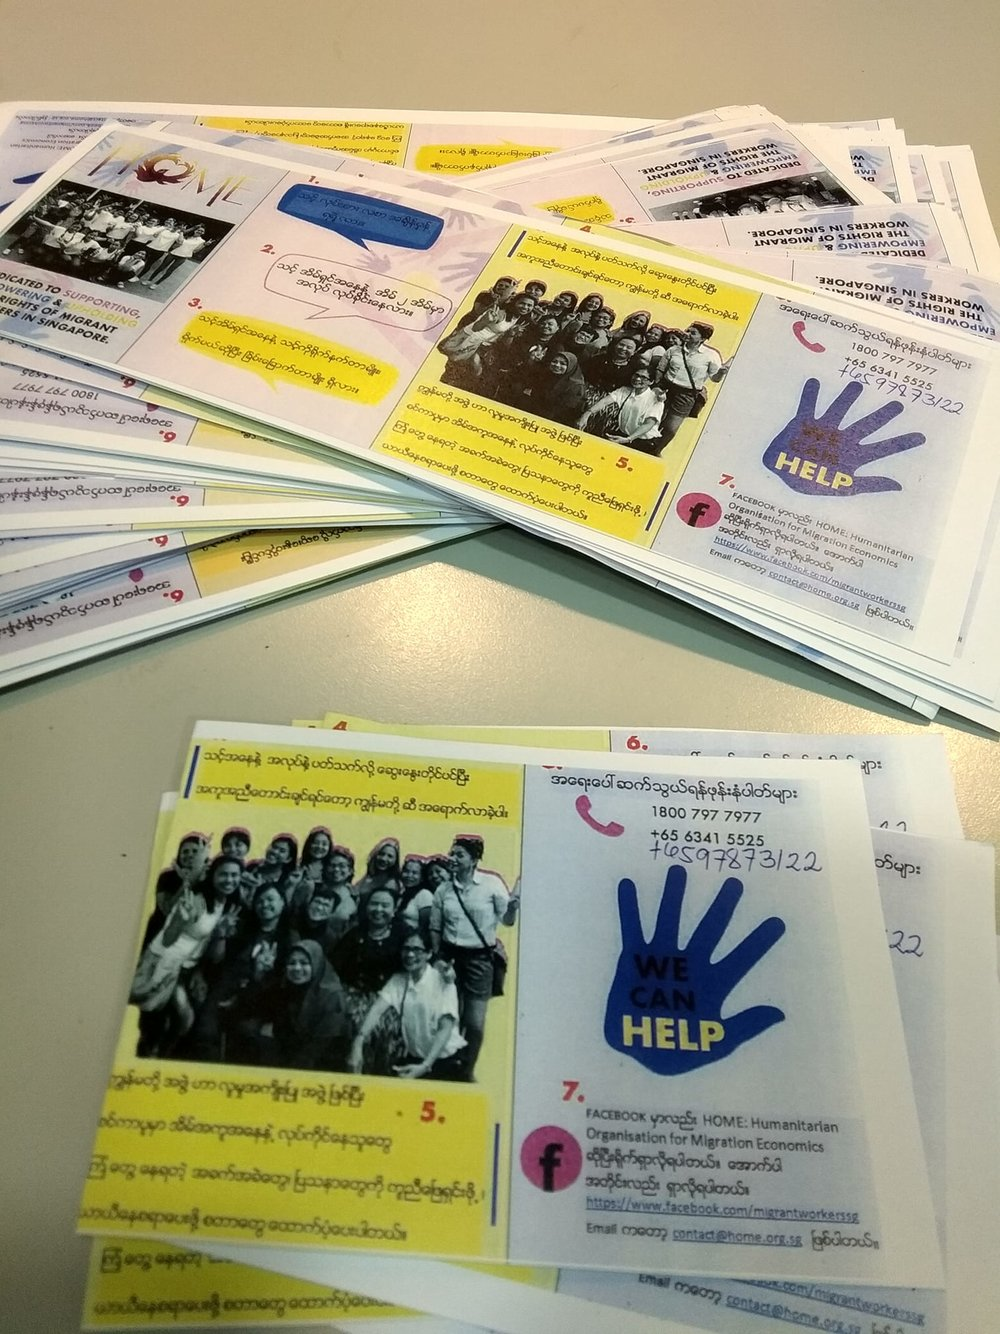 Outreach materials in Burmese